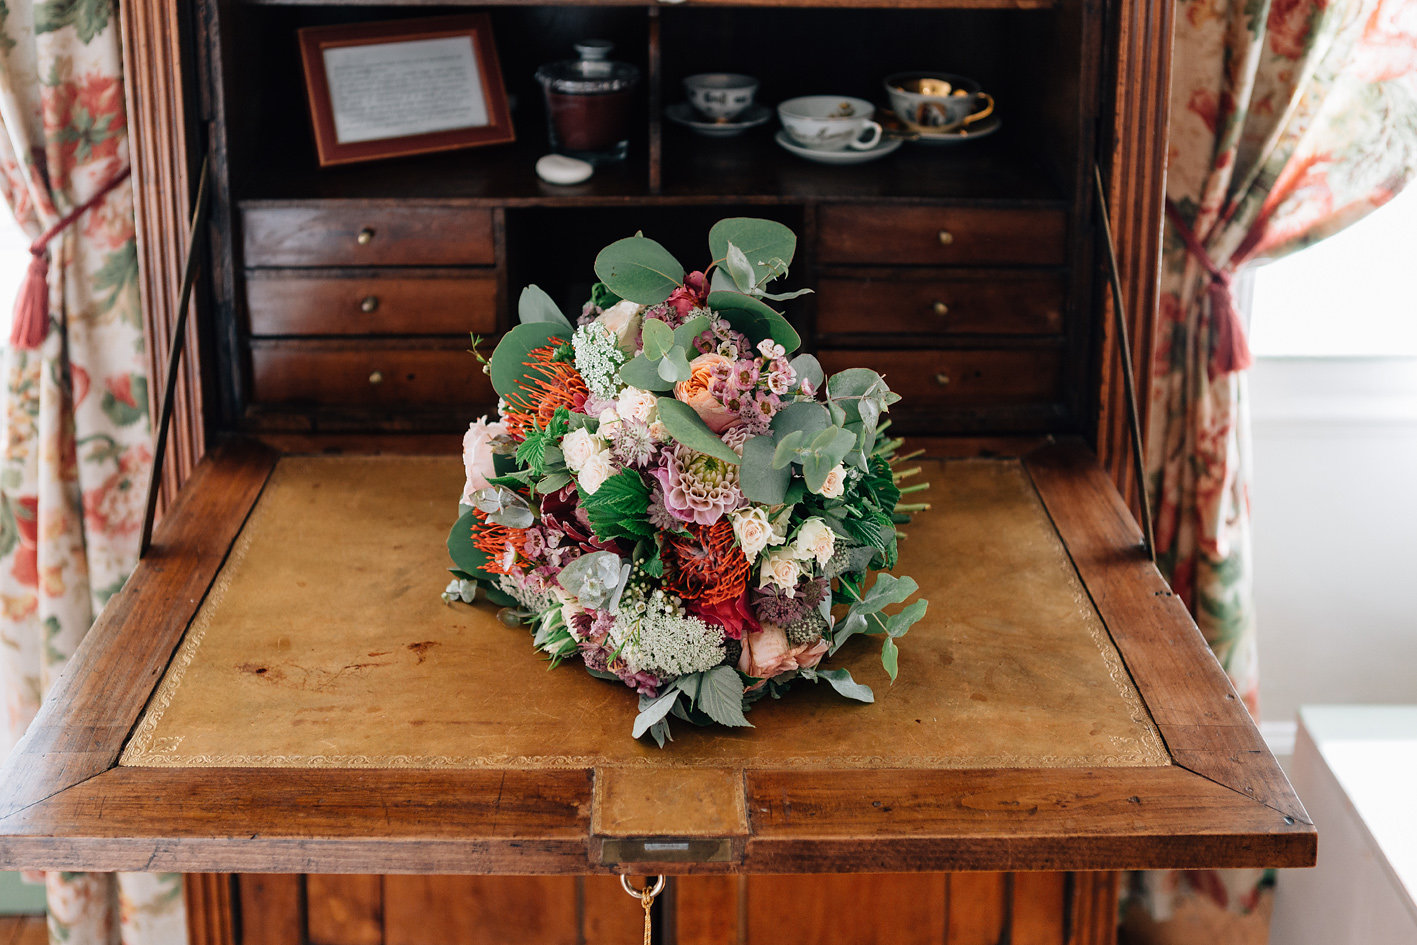 pierreatelier-photographe-mariage-paris-orangeriedevatimesnil-155.jpg